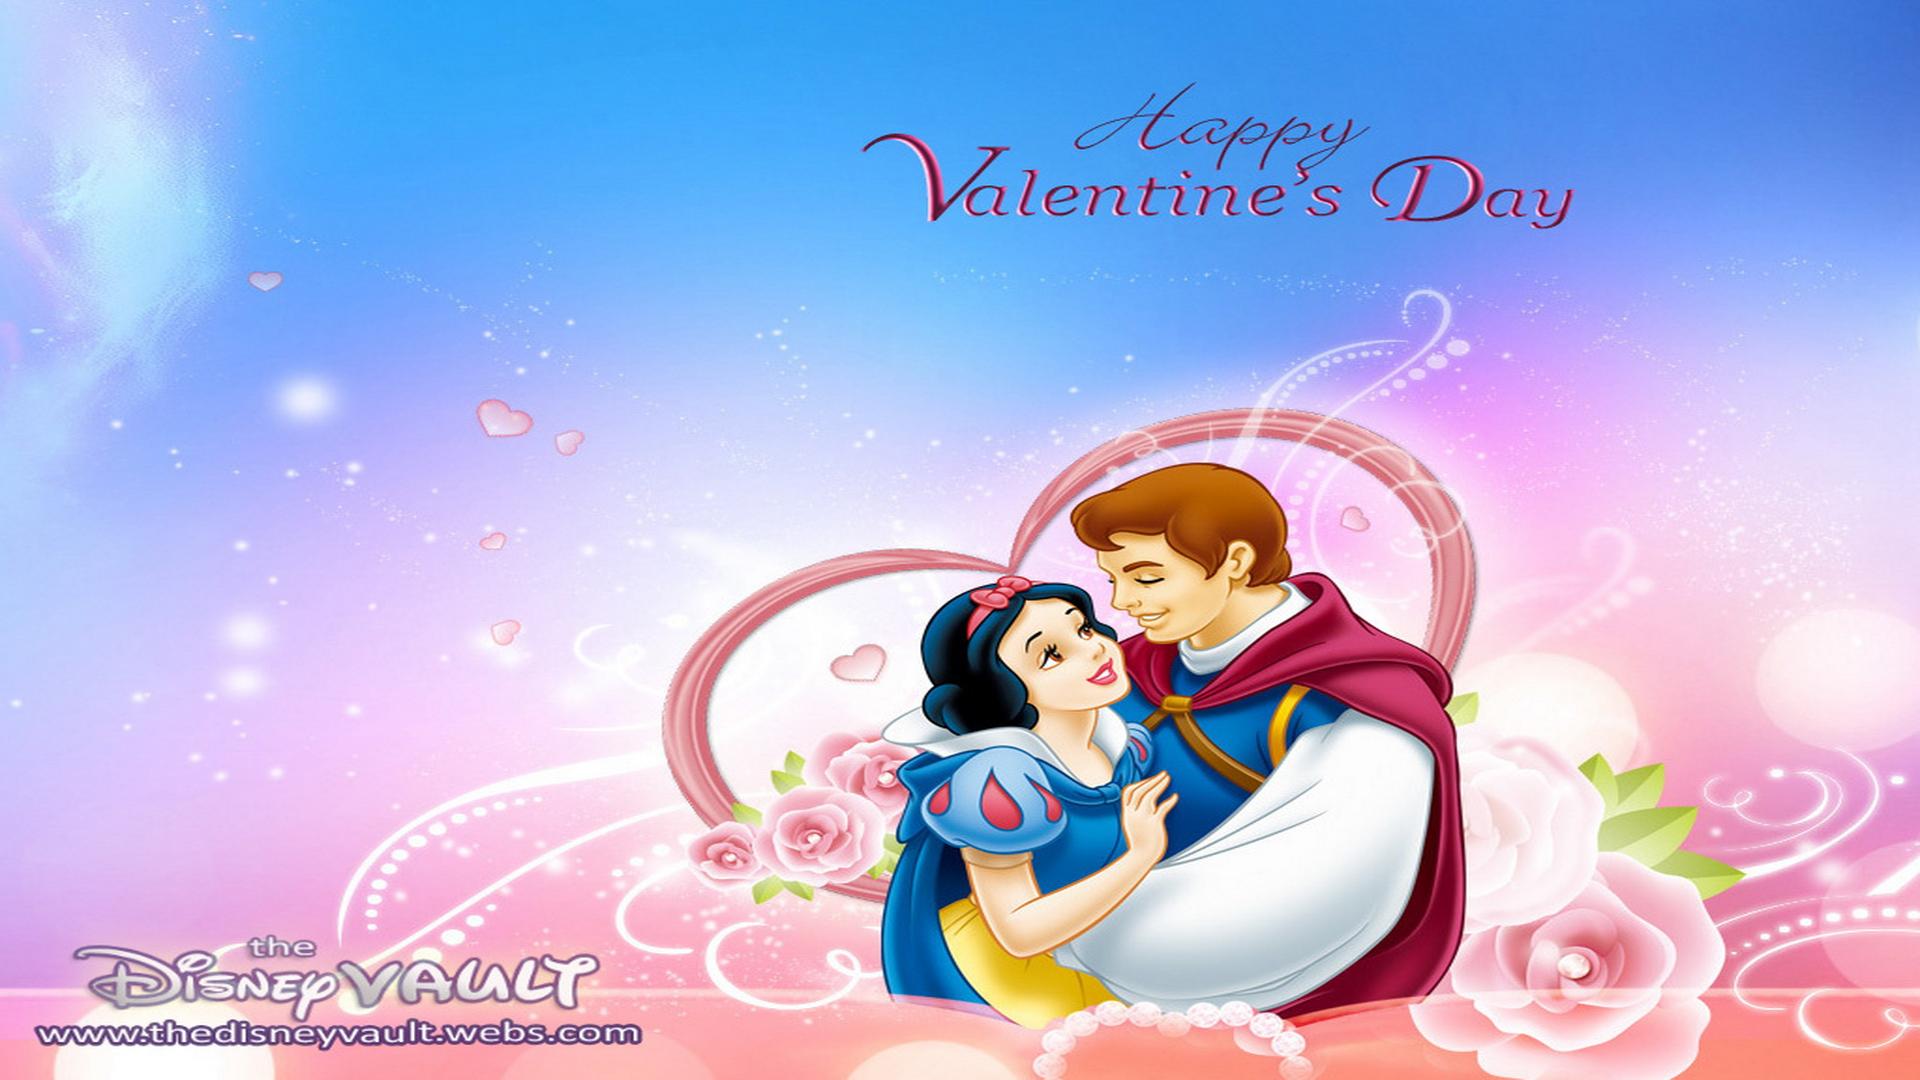 Disney Wallpaper Snow White Valentine s Day Wallpaper disney 7904831 1920x1080